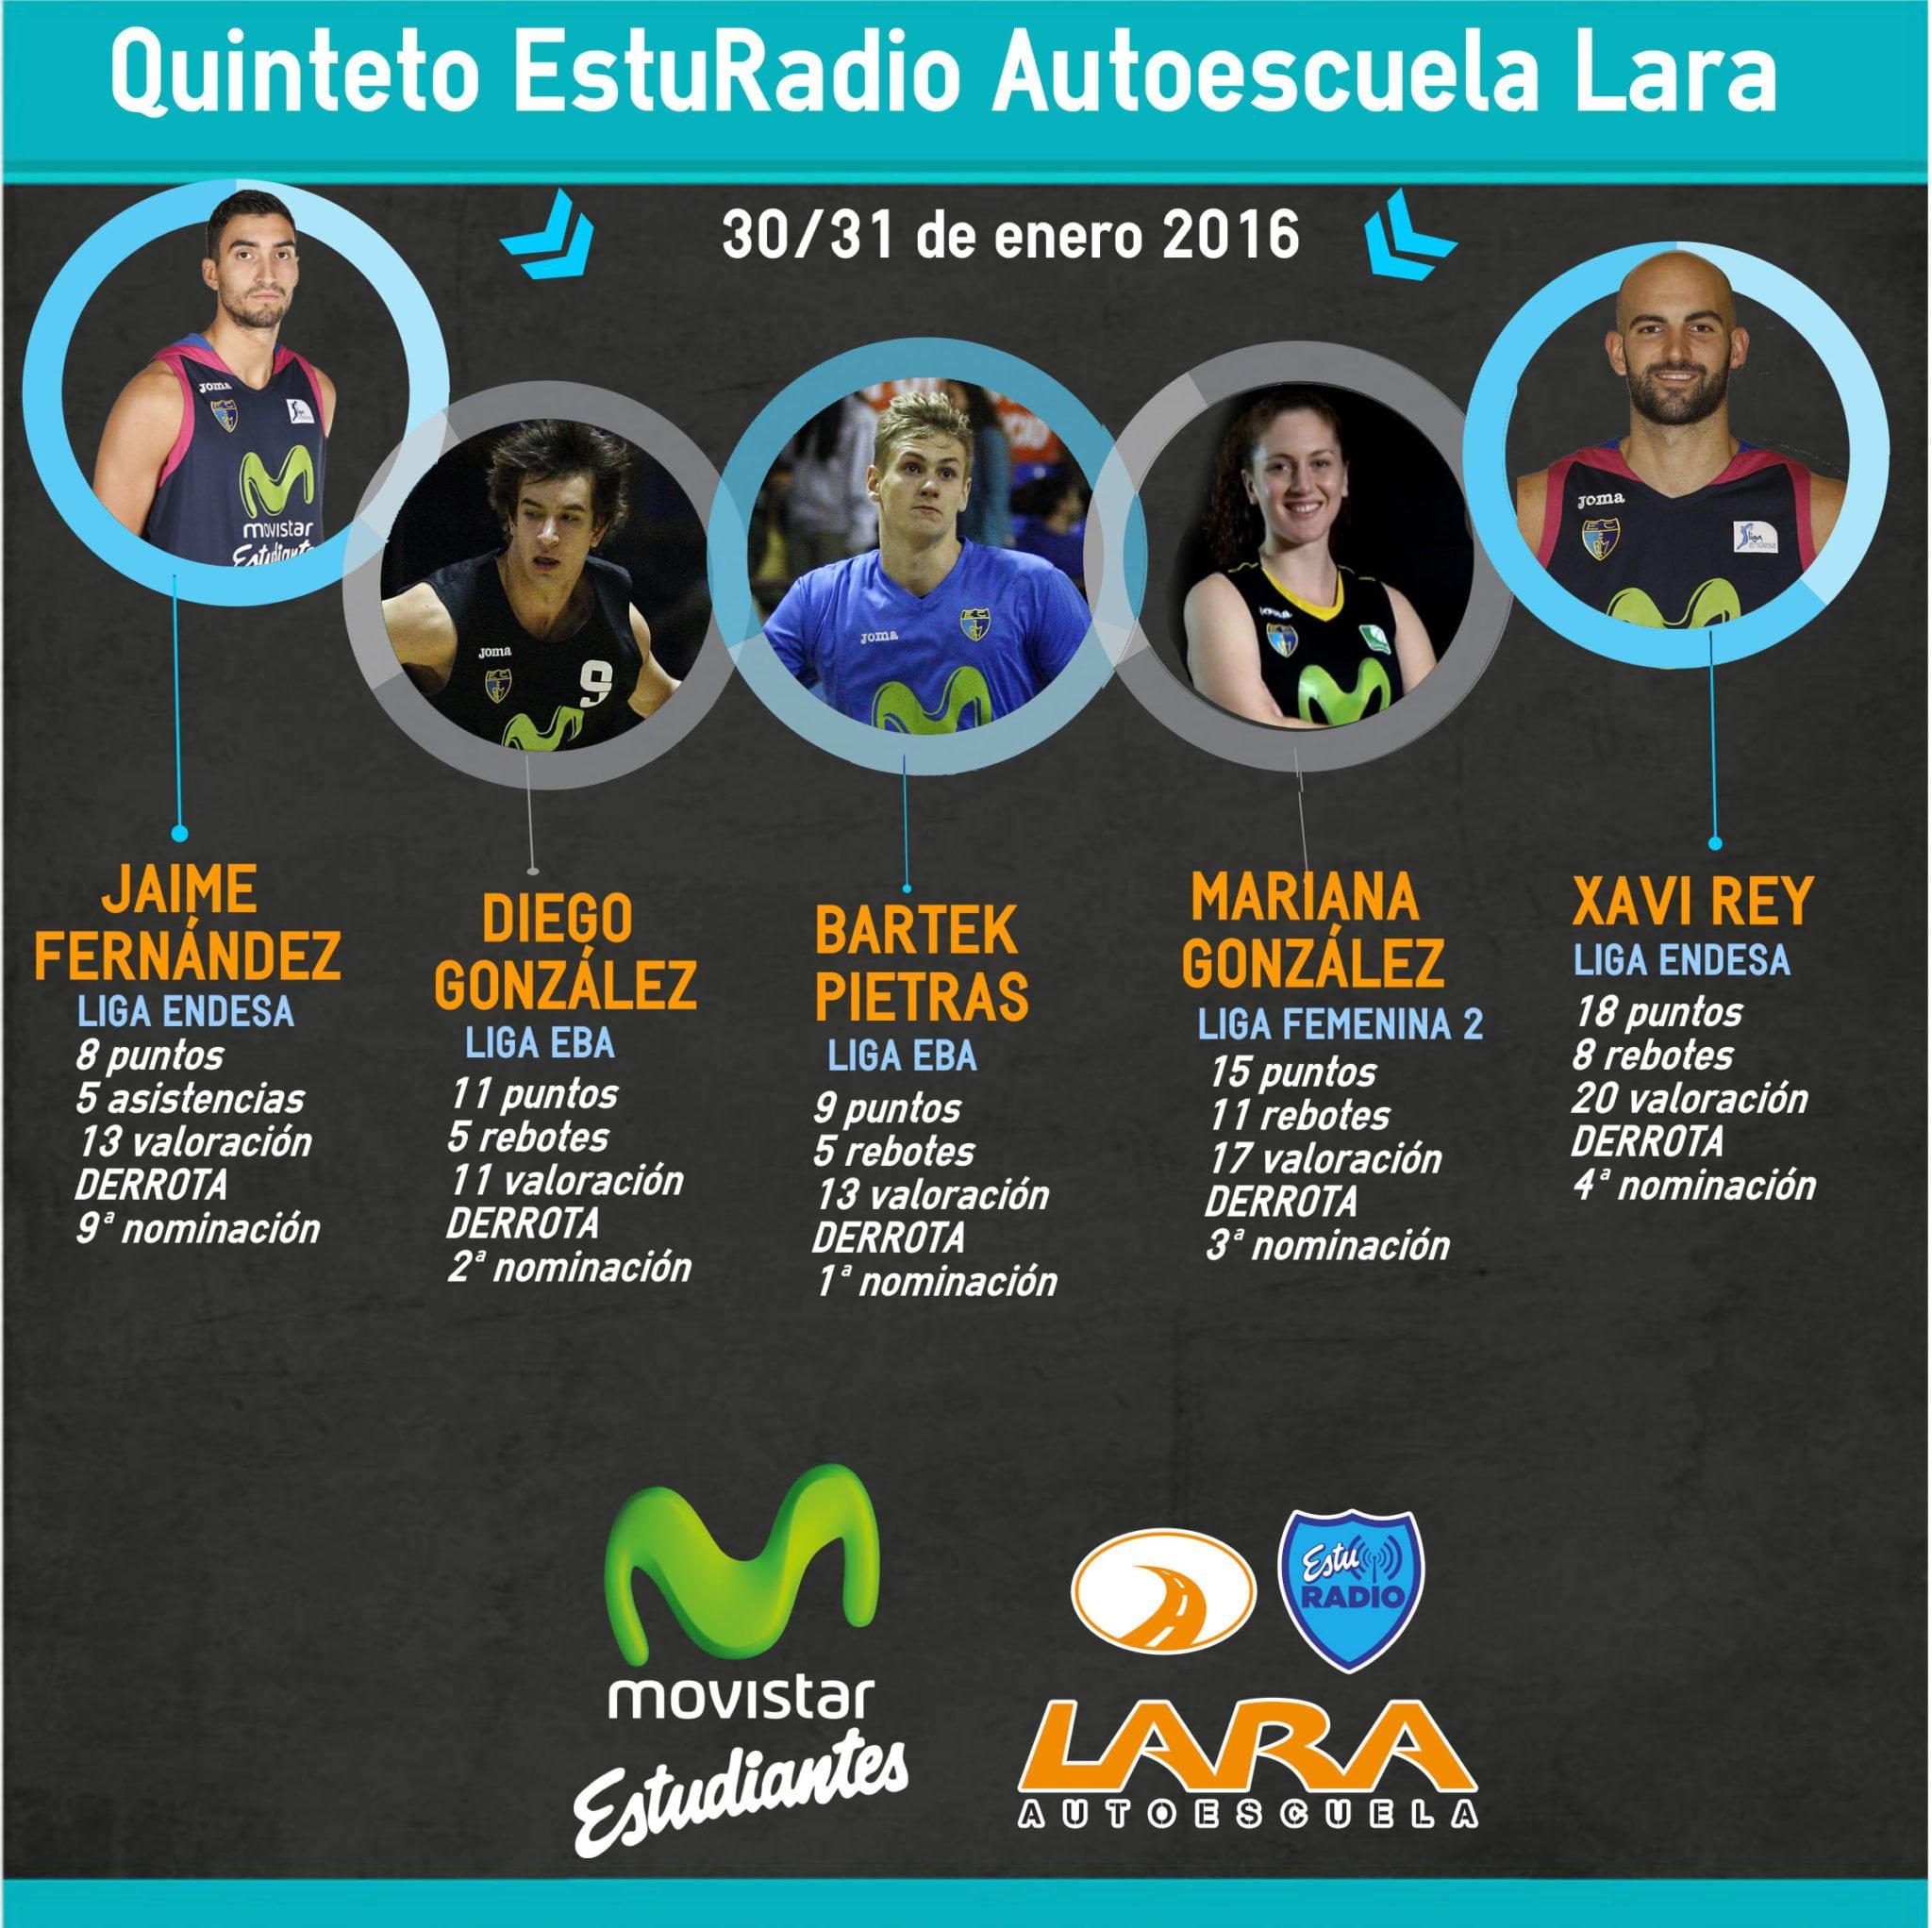 Quinteto EstuRadio Autoescuela Lara: Jaime Fernández, Diego González, Bartek Pietras, Mariana González y Xavi Rey